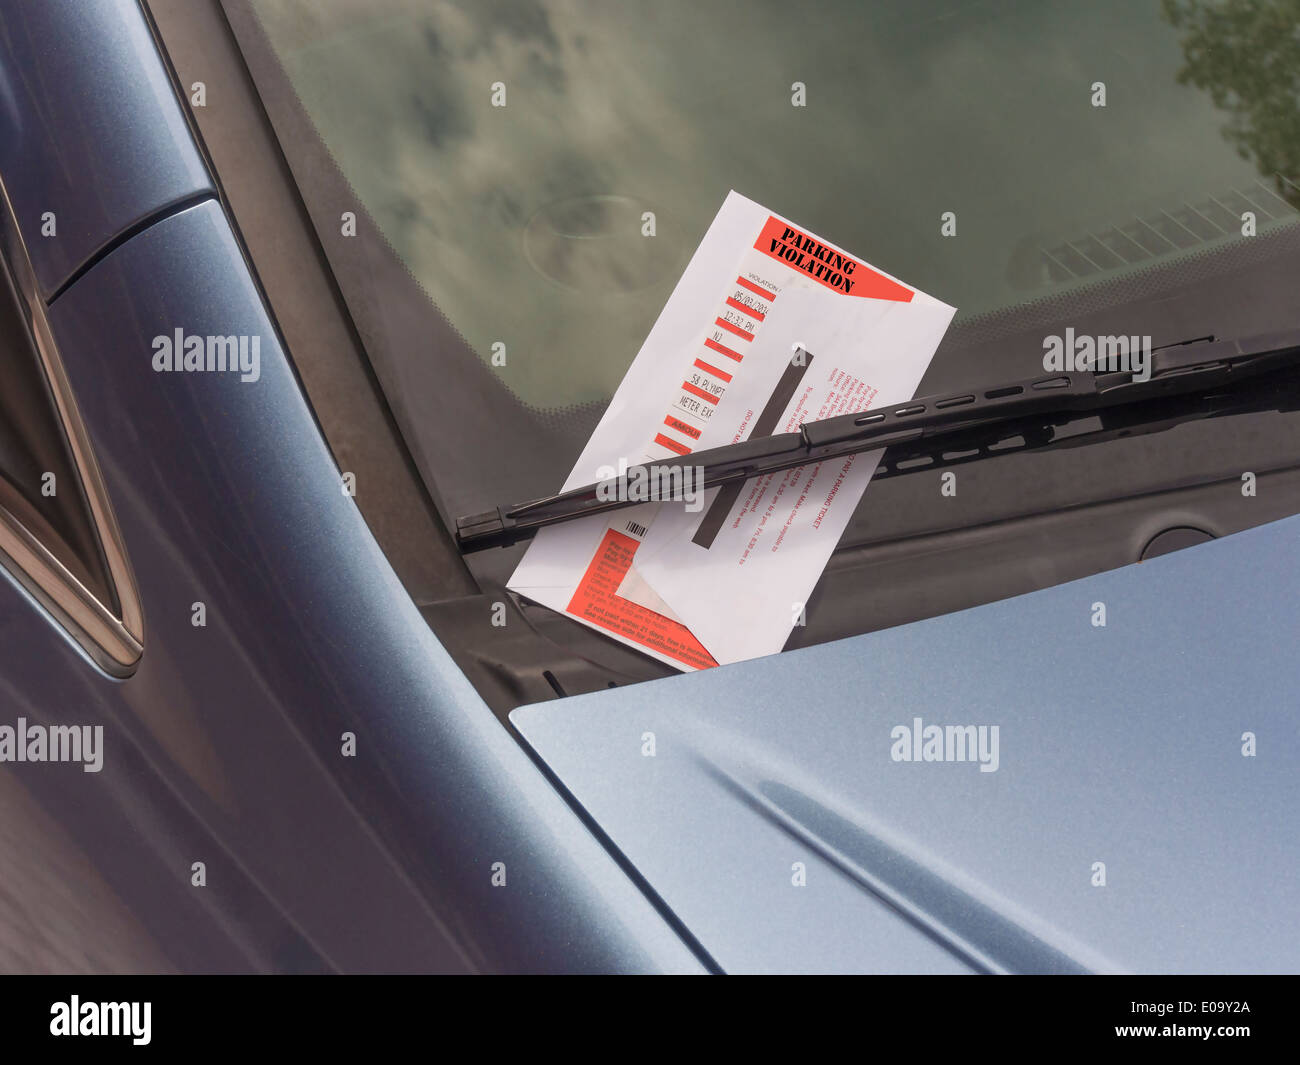 Parking ticket violation - Stock Image